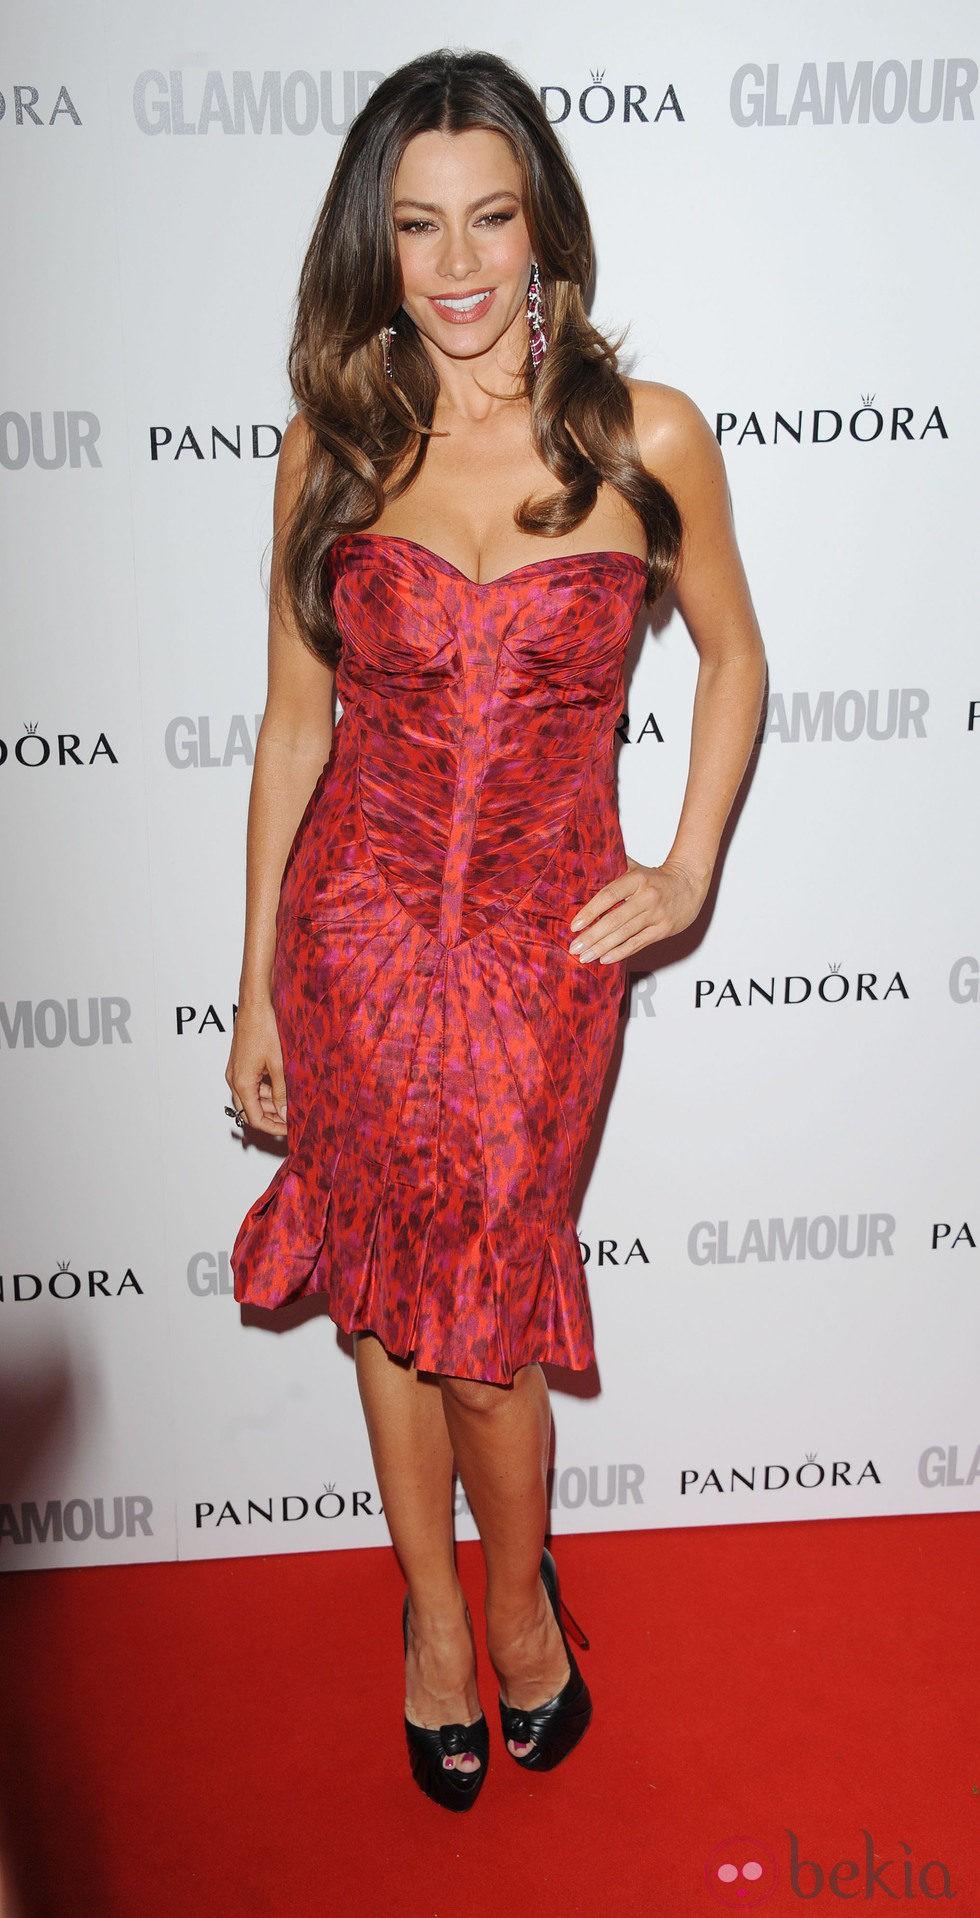 Sofia Vergara en los Glamour Women of the Year Awards 2012 de Londres